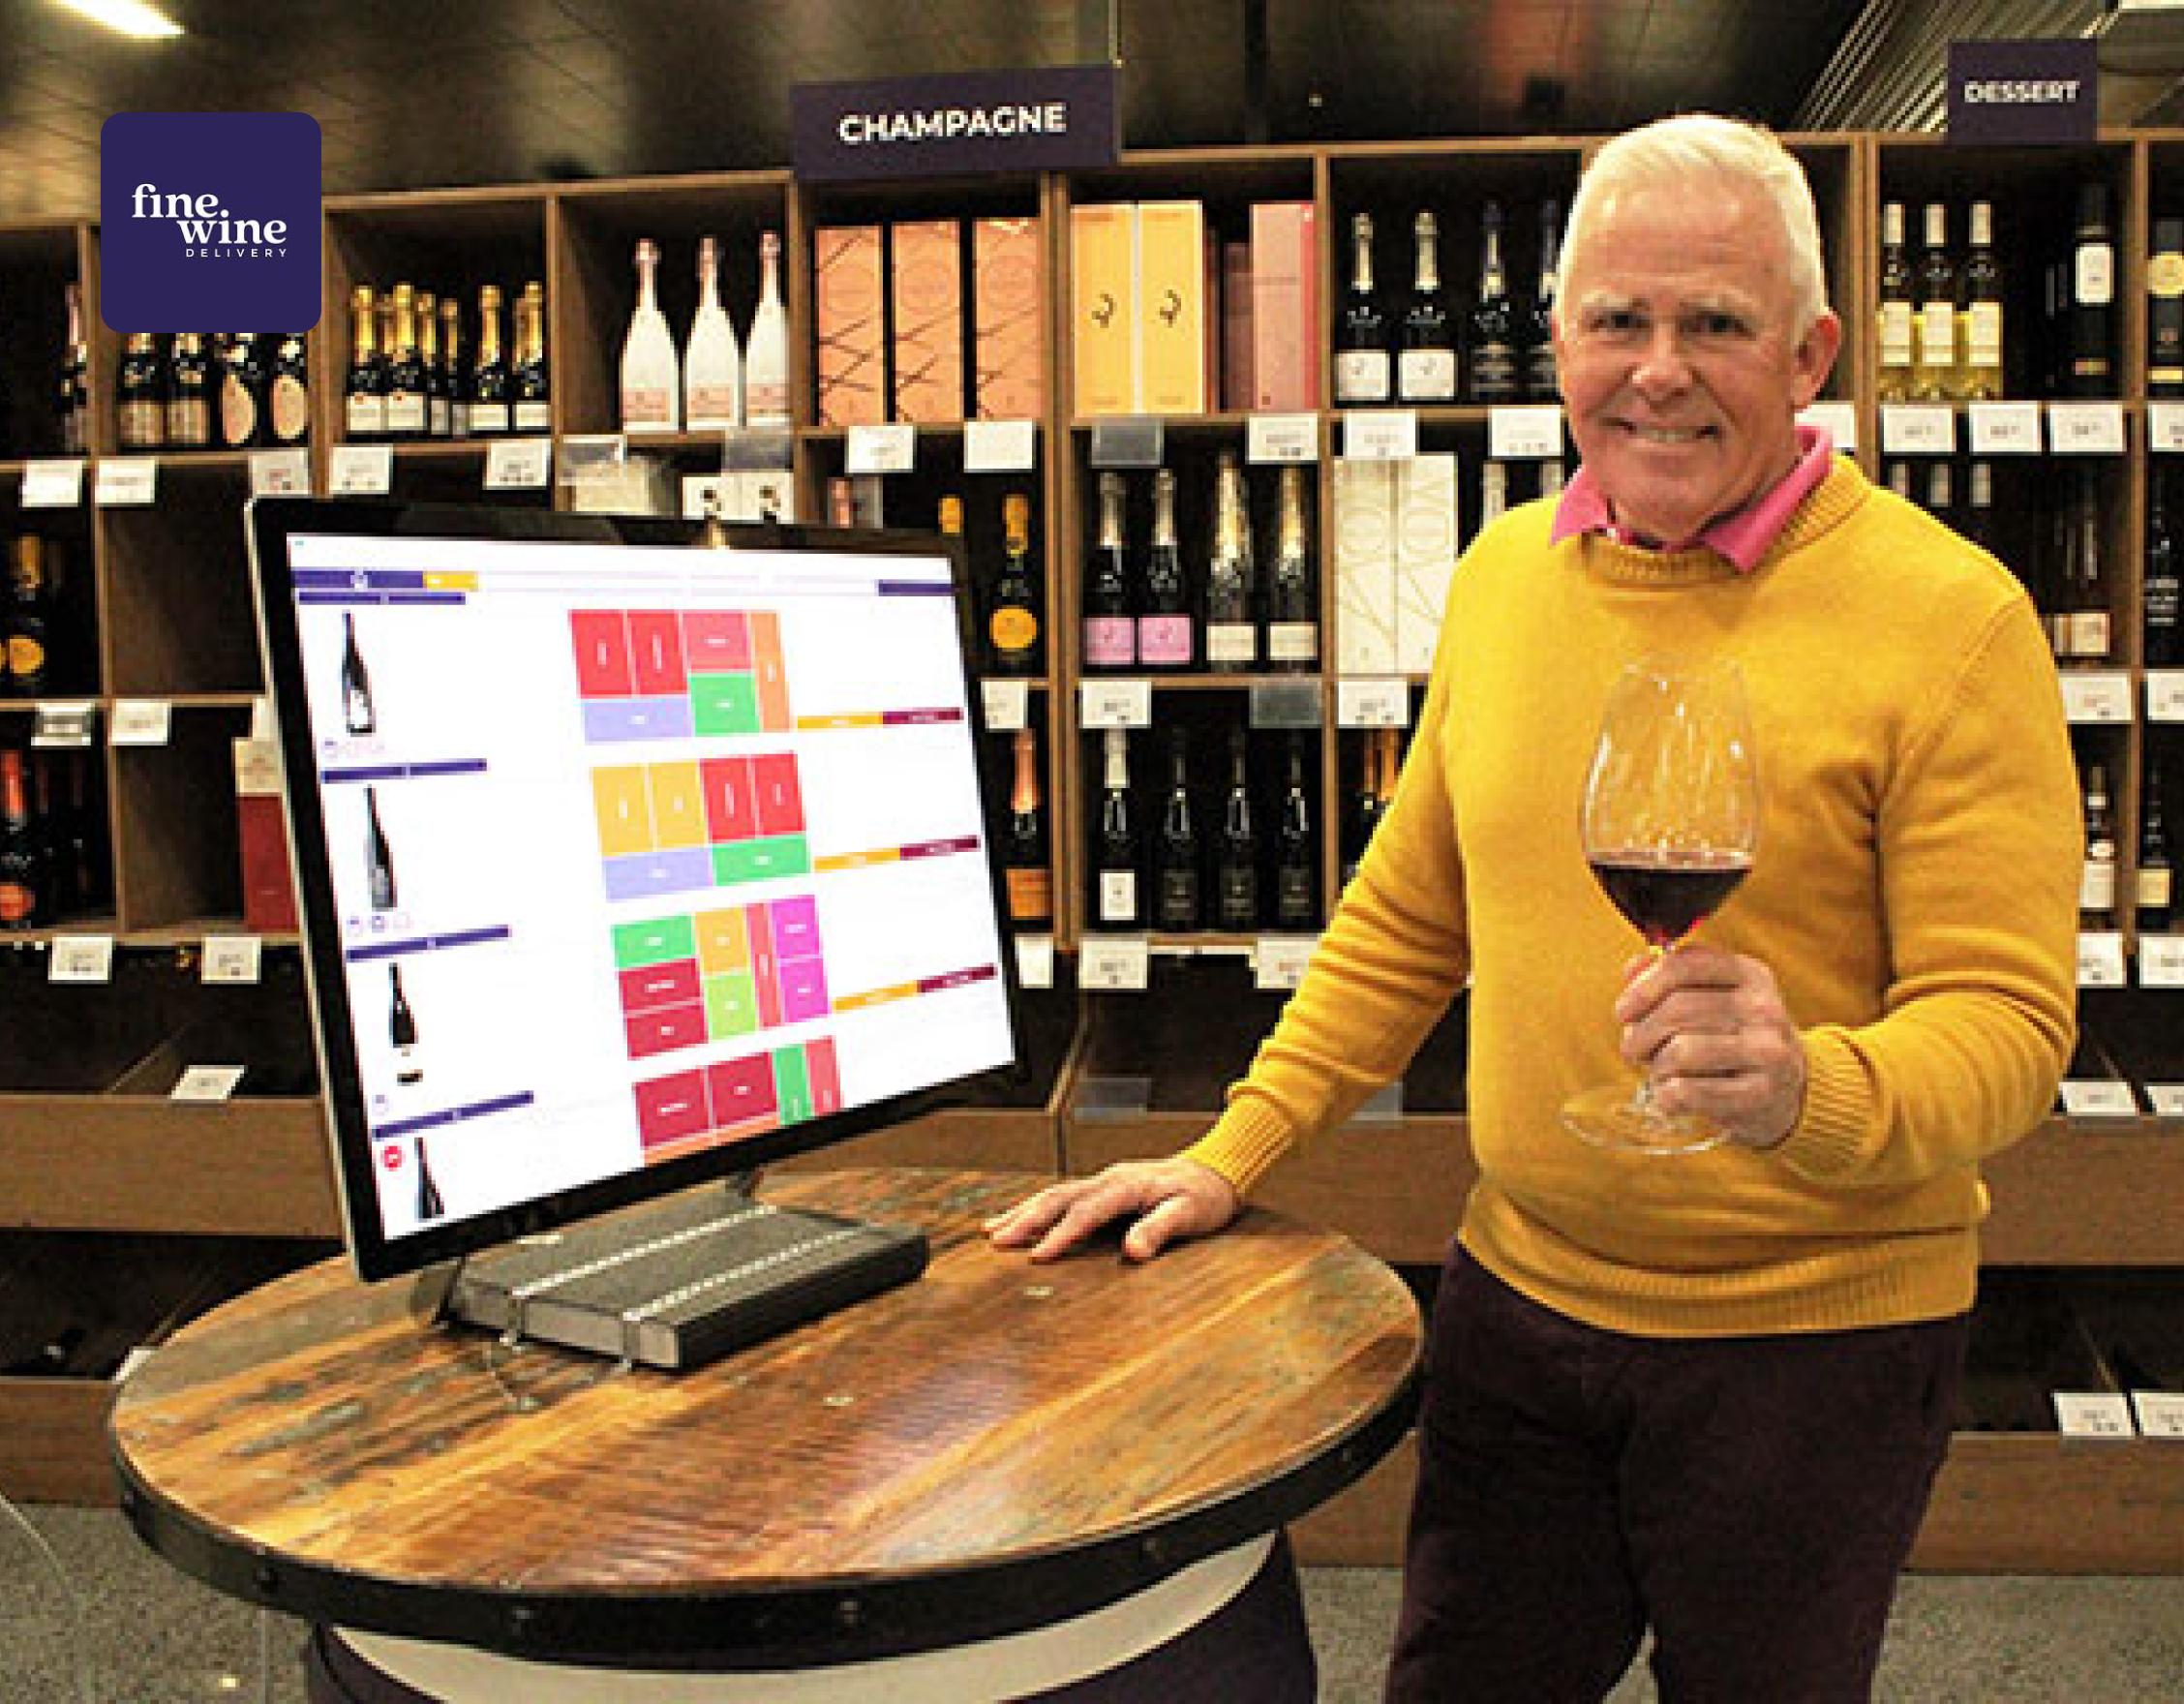 Fine Wine Delivery Case Study Image